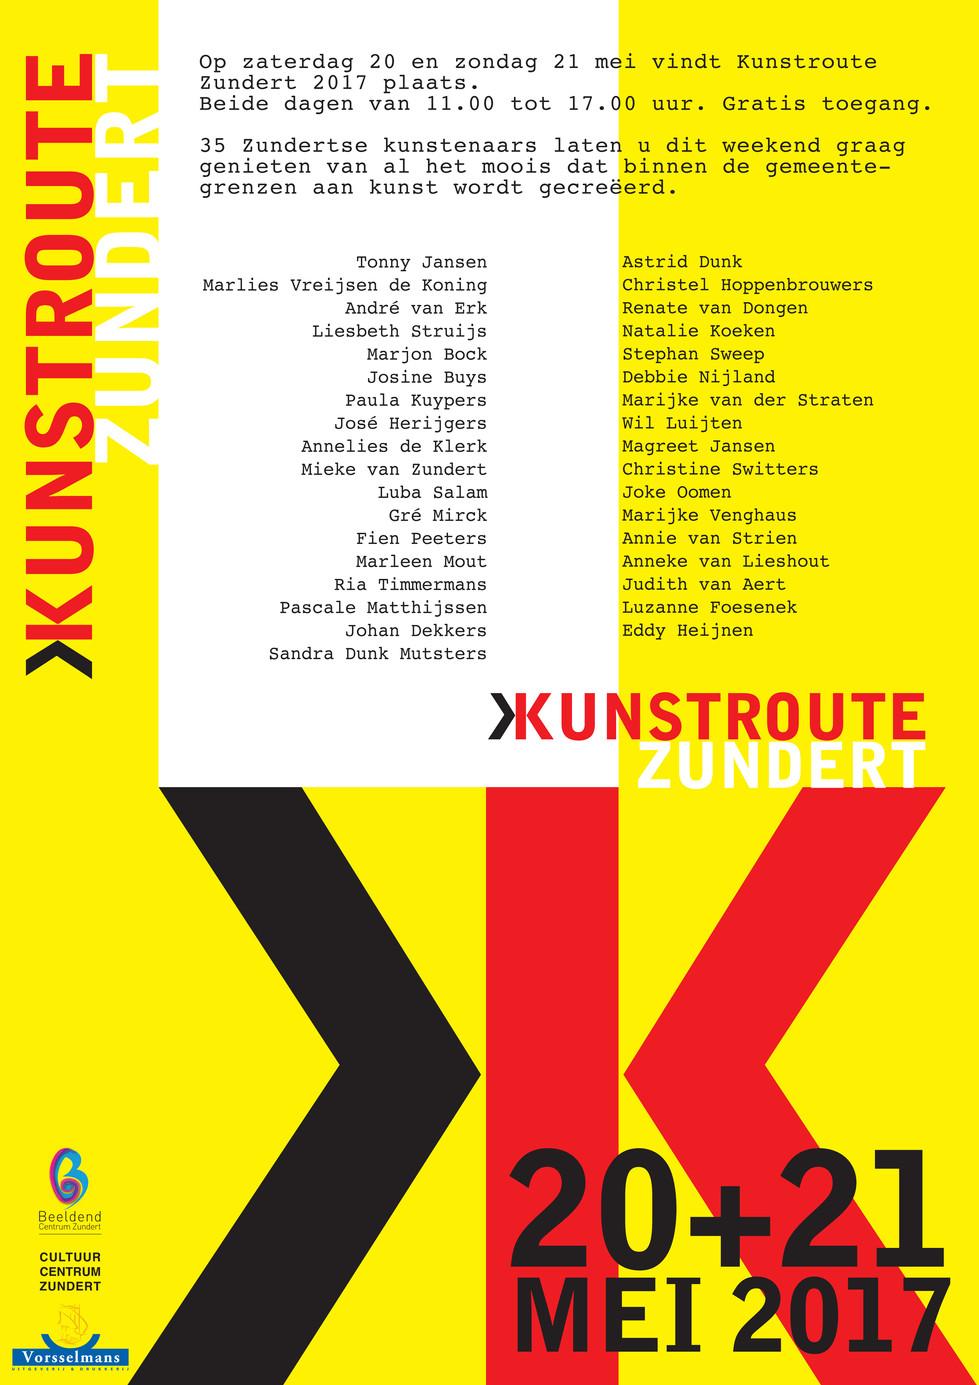 Kunstroute Zundert 2017